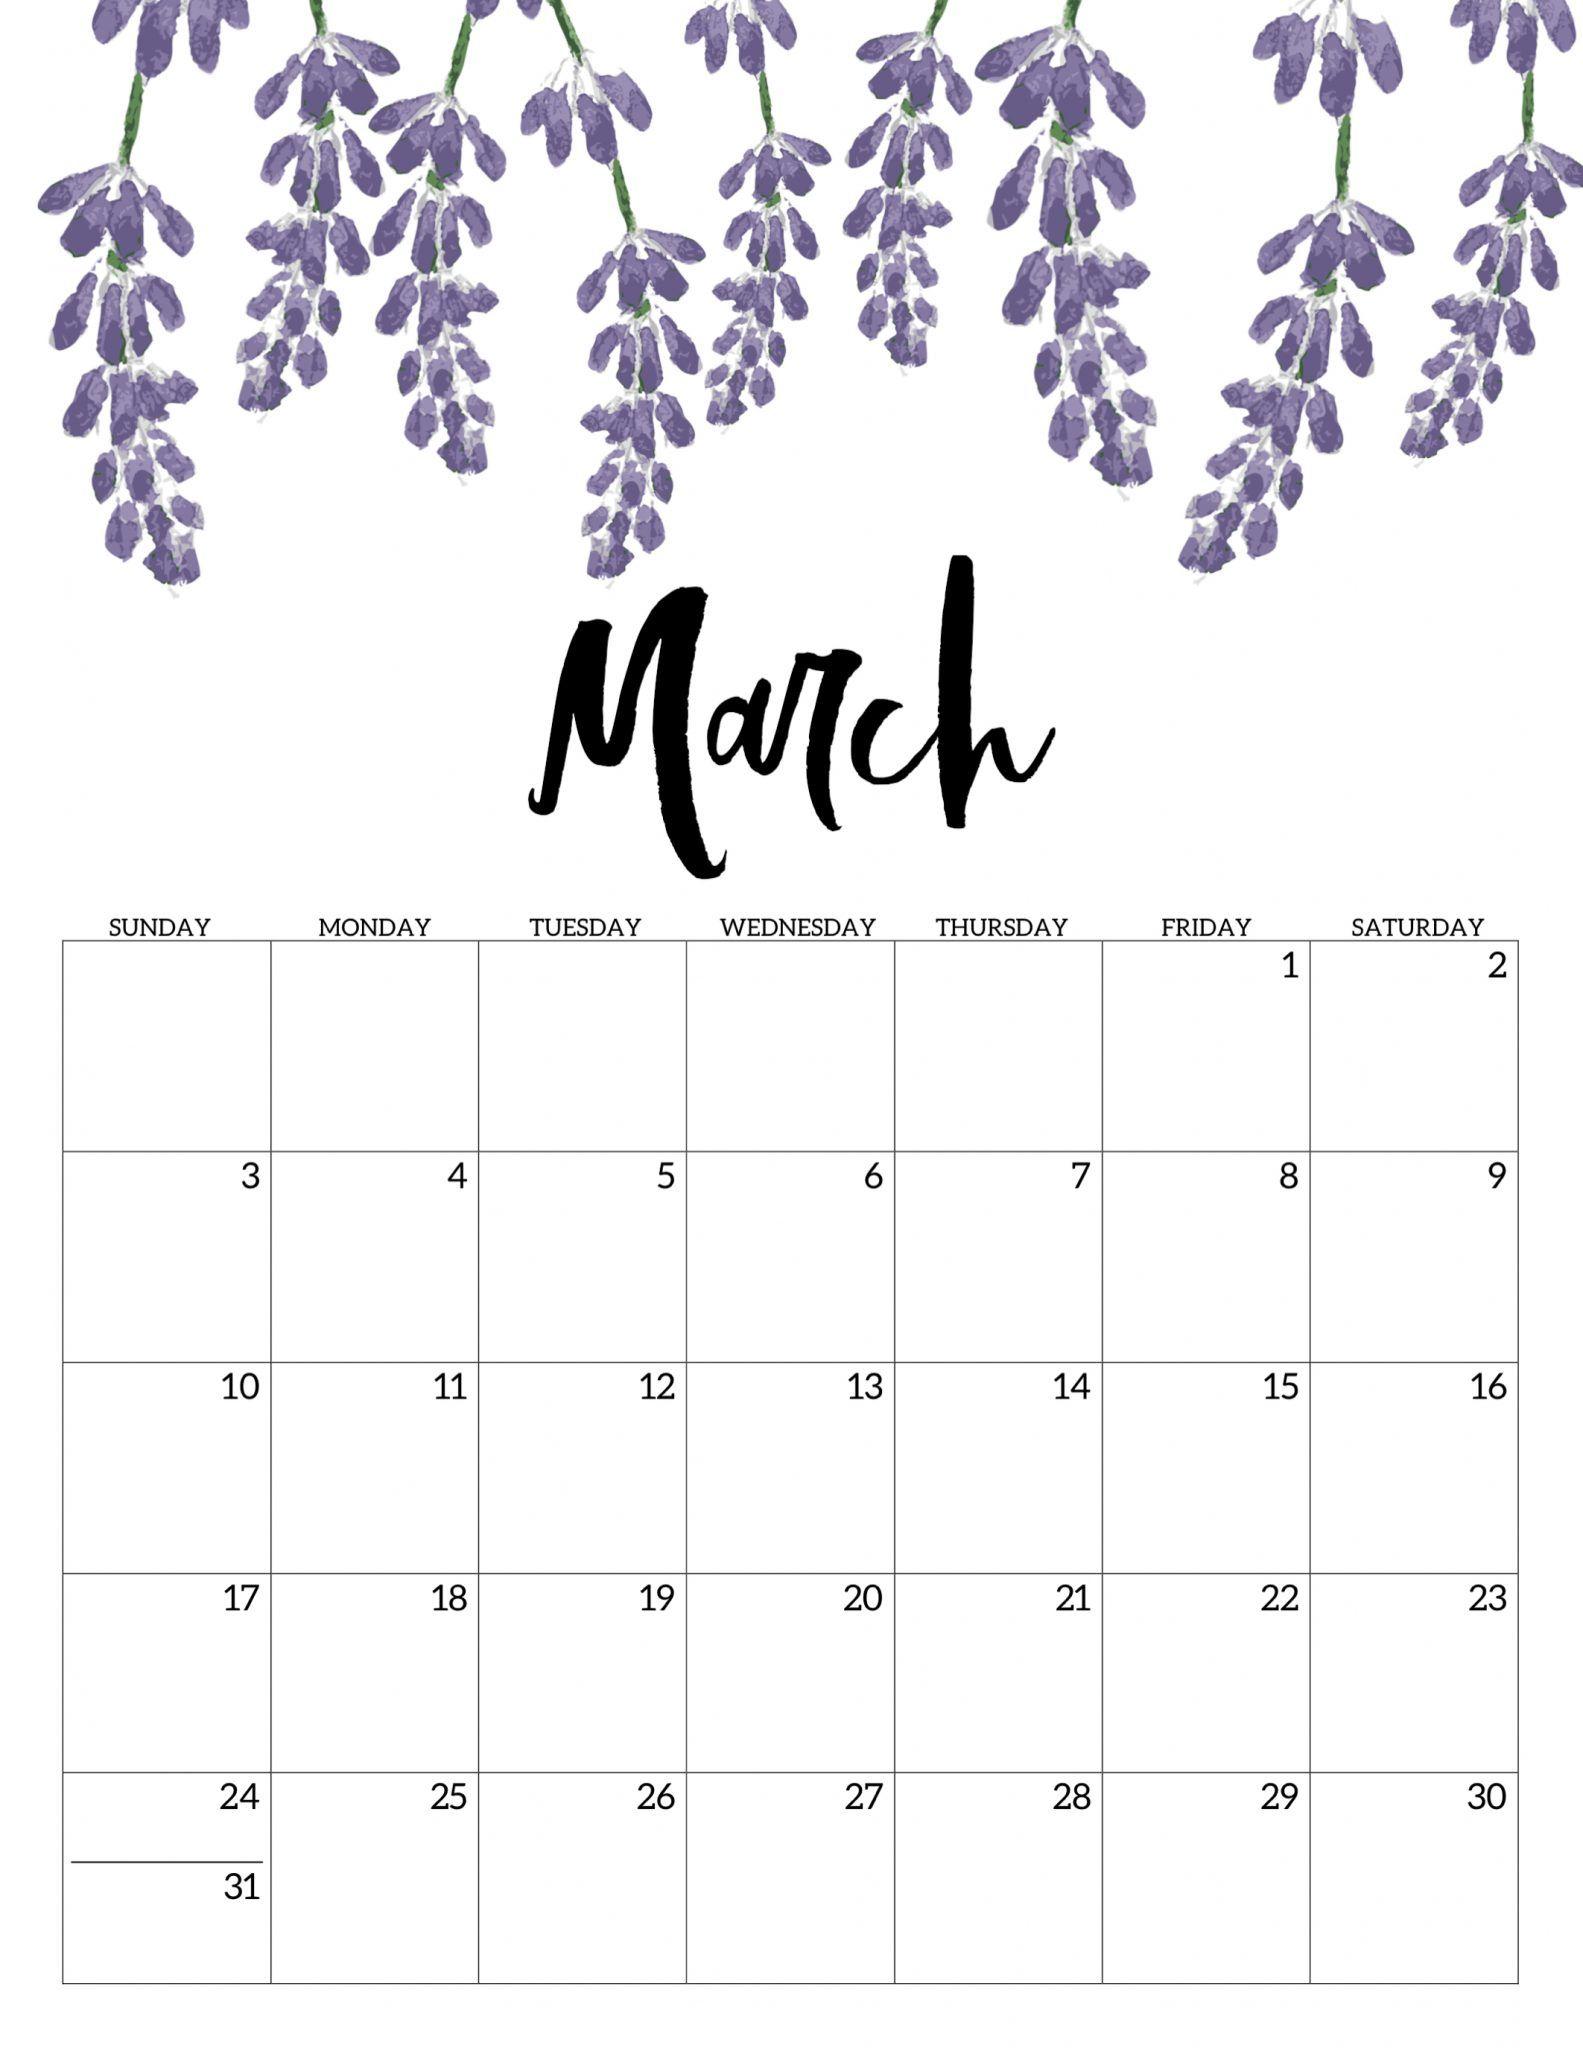 March 2019 Floral Calendar #march #march2019